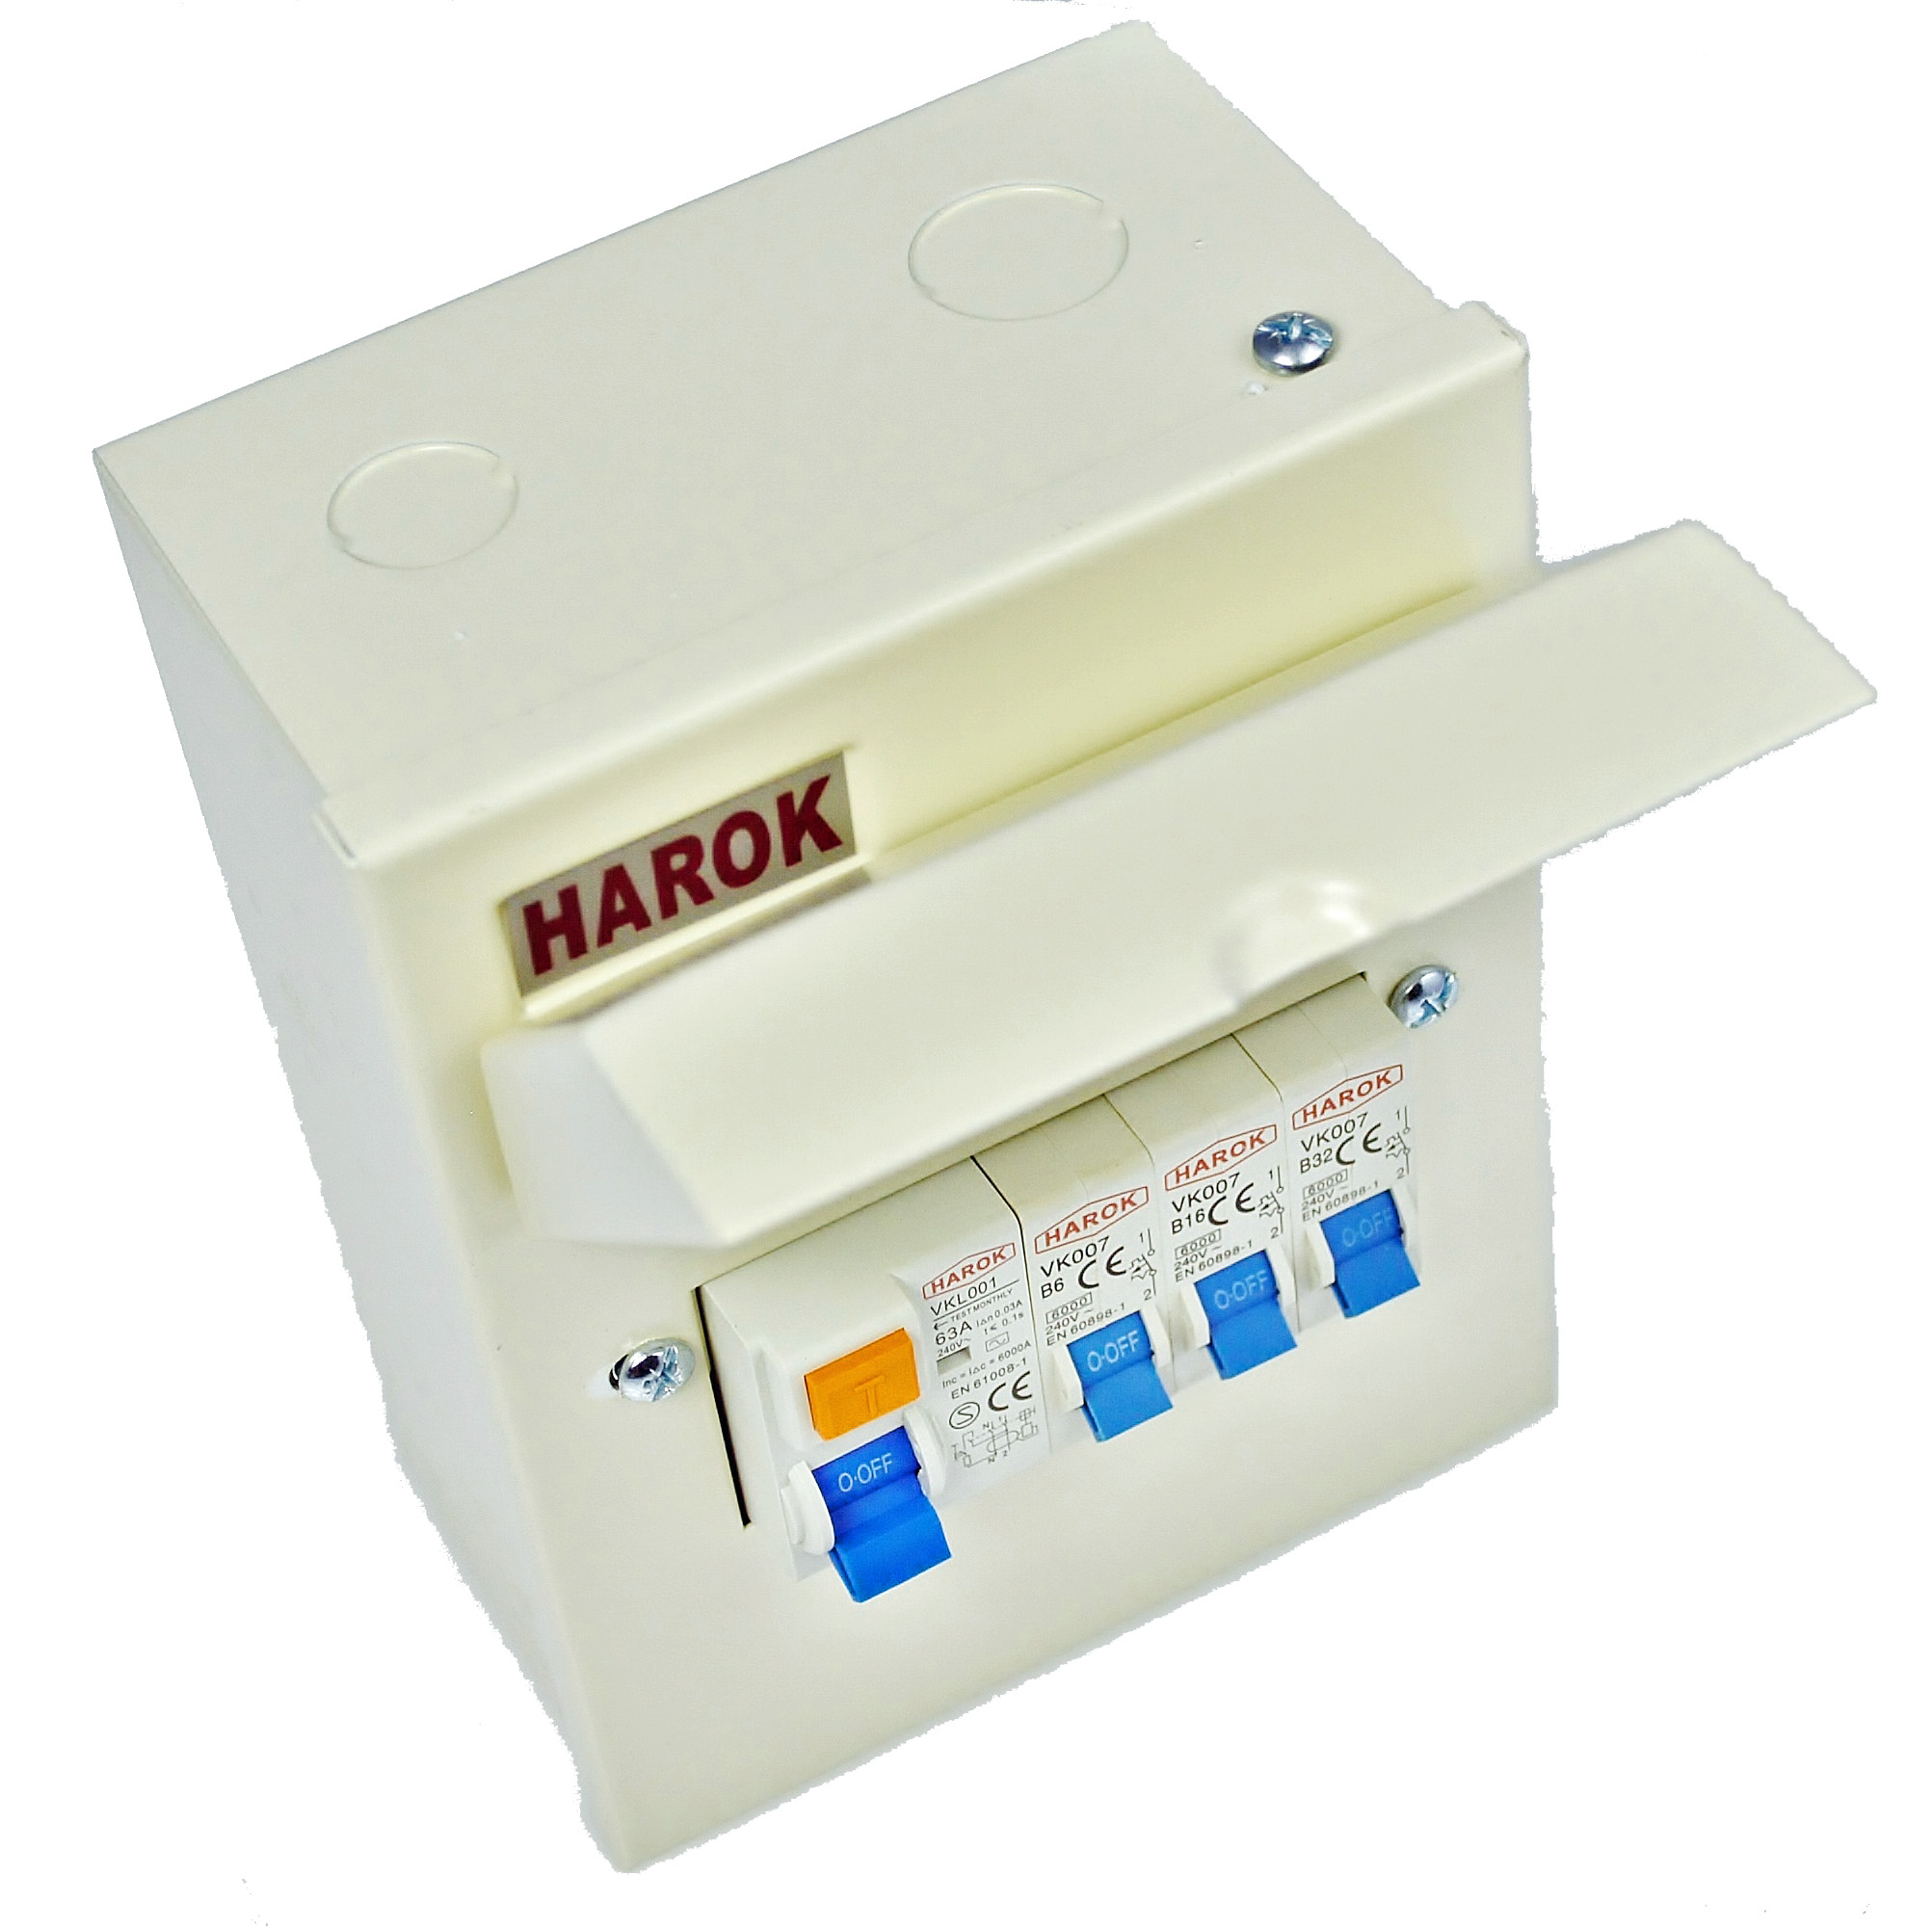 Harok – Mini Garage Consumer Unit Amendment 3